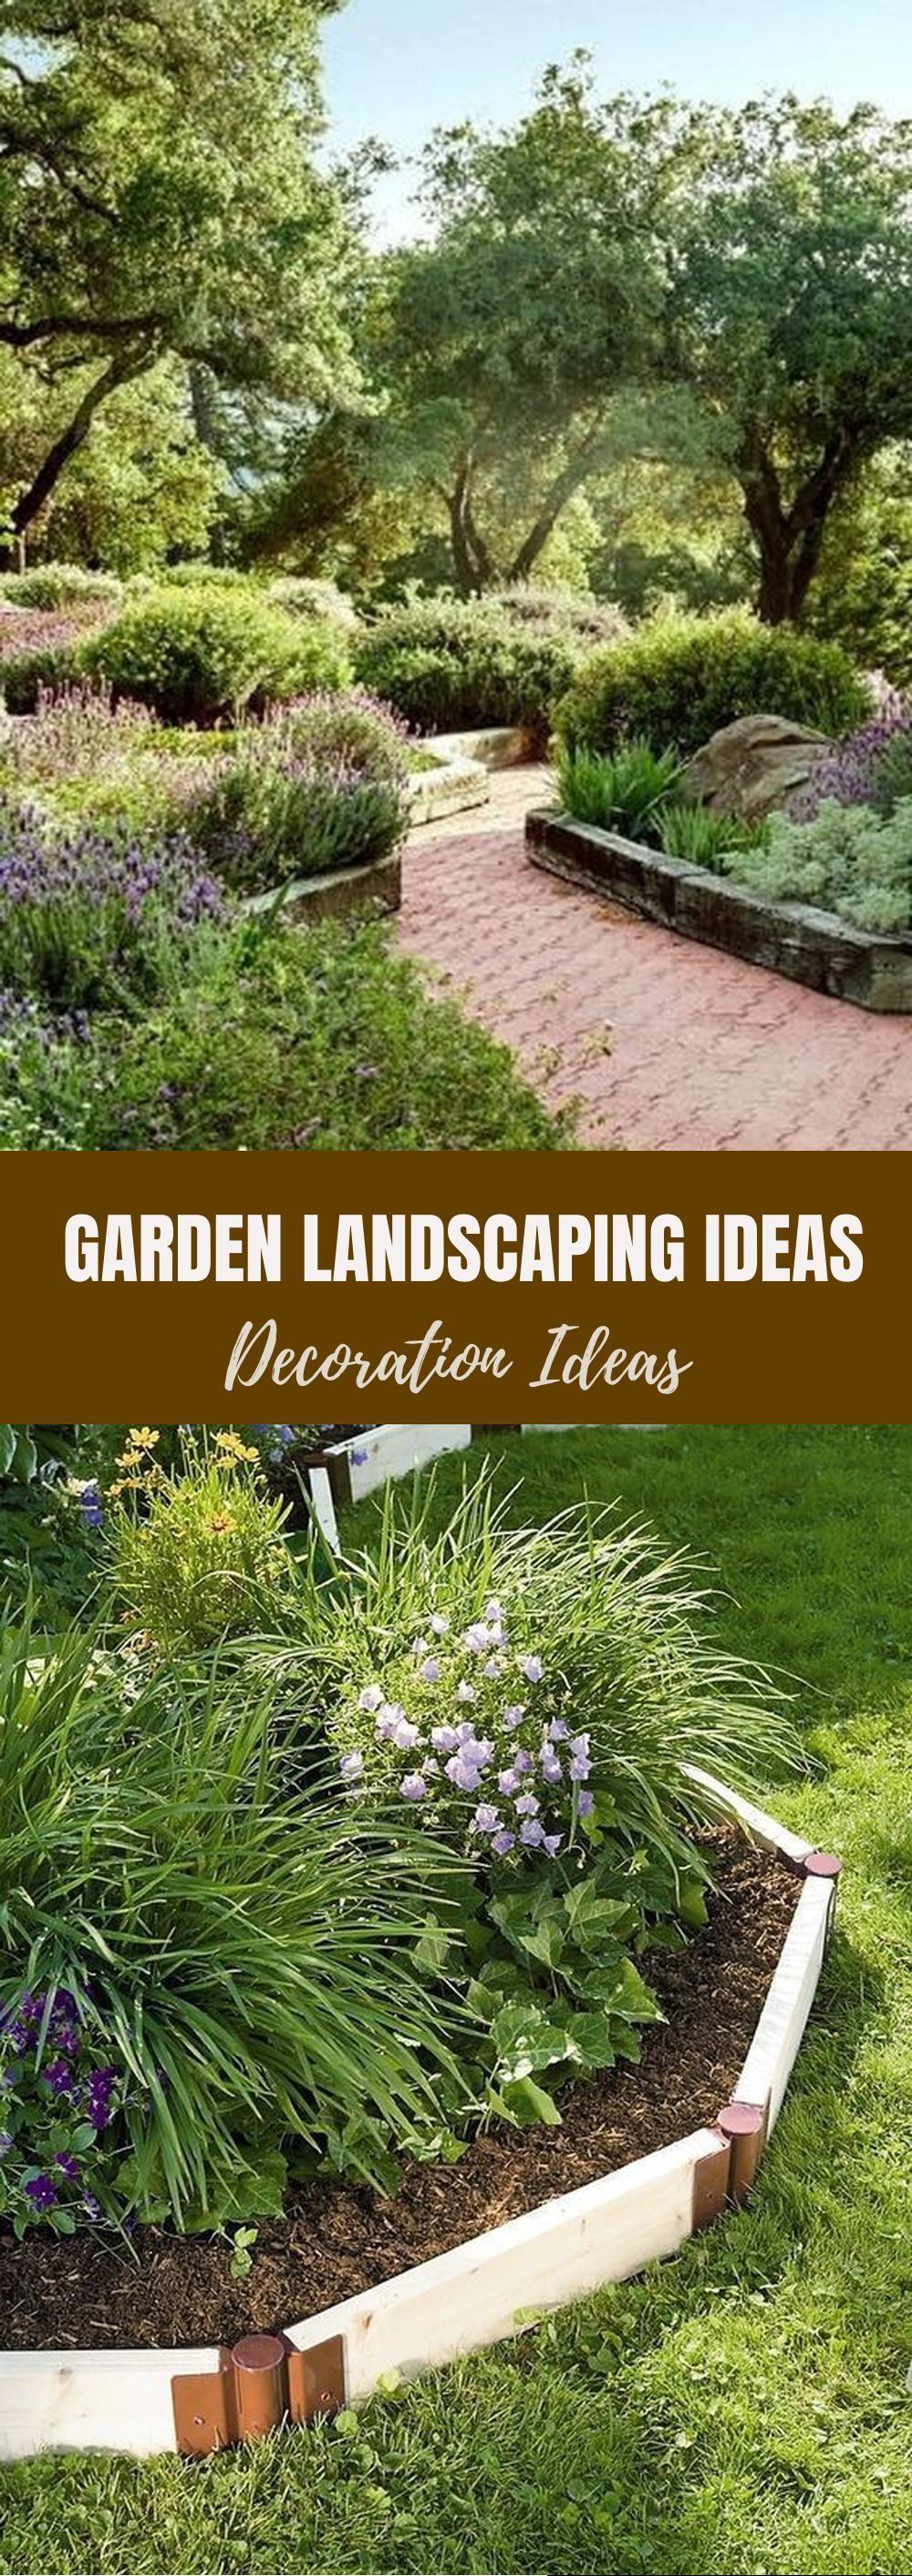 Garden Landscaping Design In 2021 Garden Landscape Design Garden Landscaping Backyard Diy Garden Landscaping Backyard diy landscaping ideas